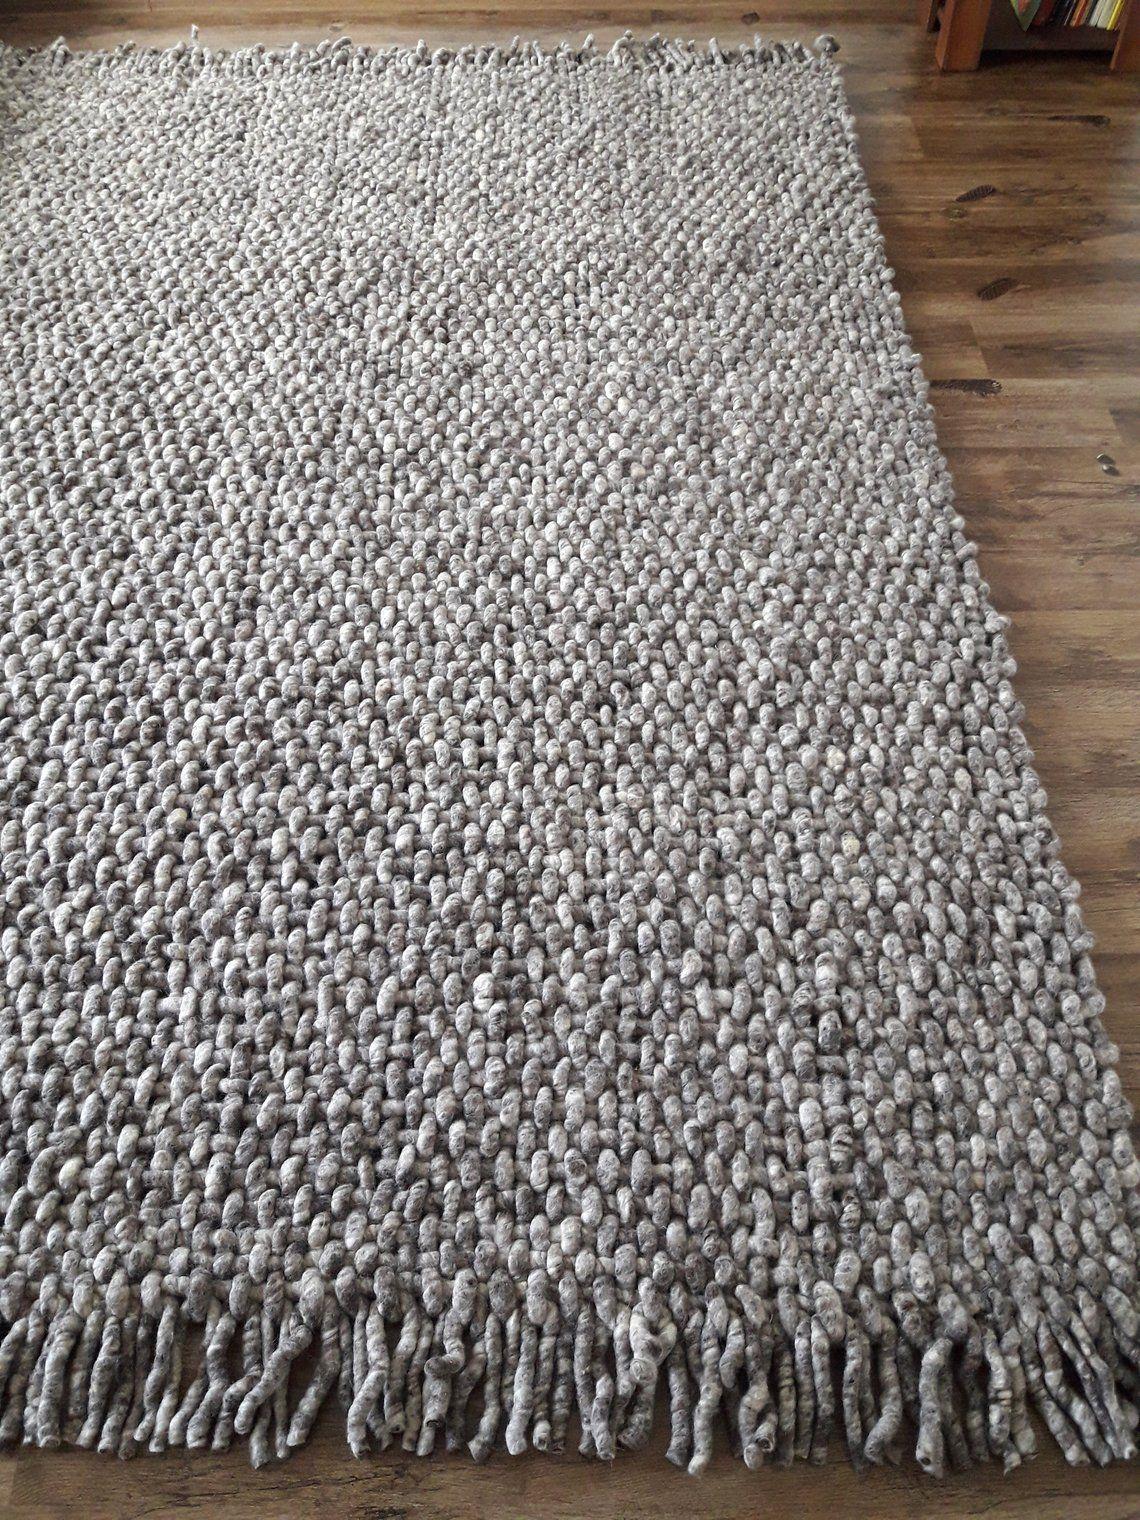 Wool Rug Woven Gray Area Rugs 8x10 Handwoven Rugs Scandinavian